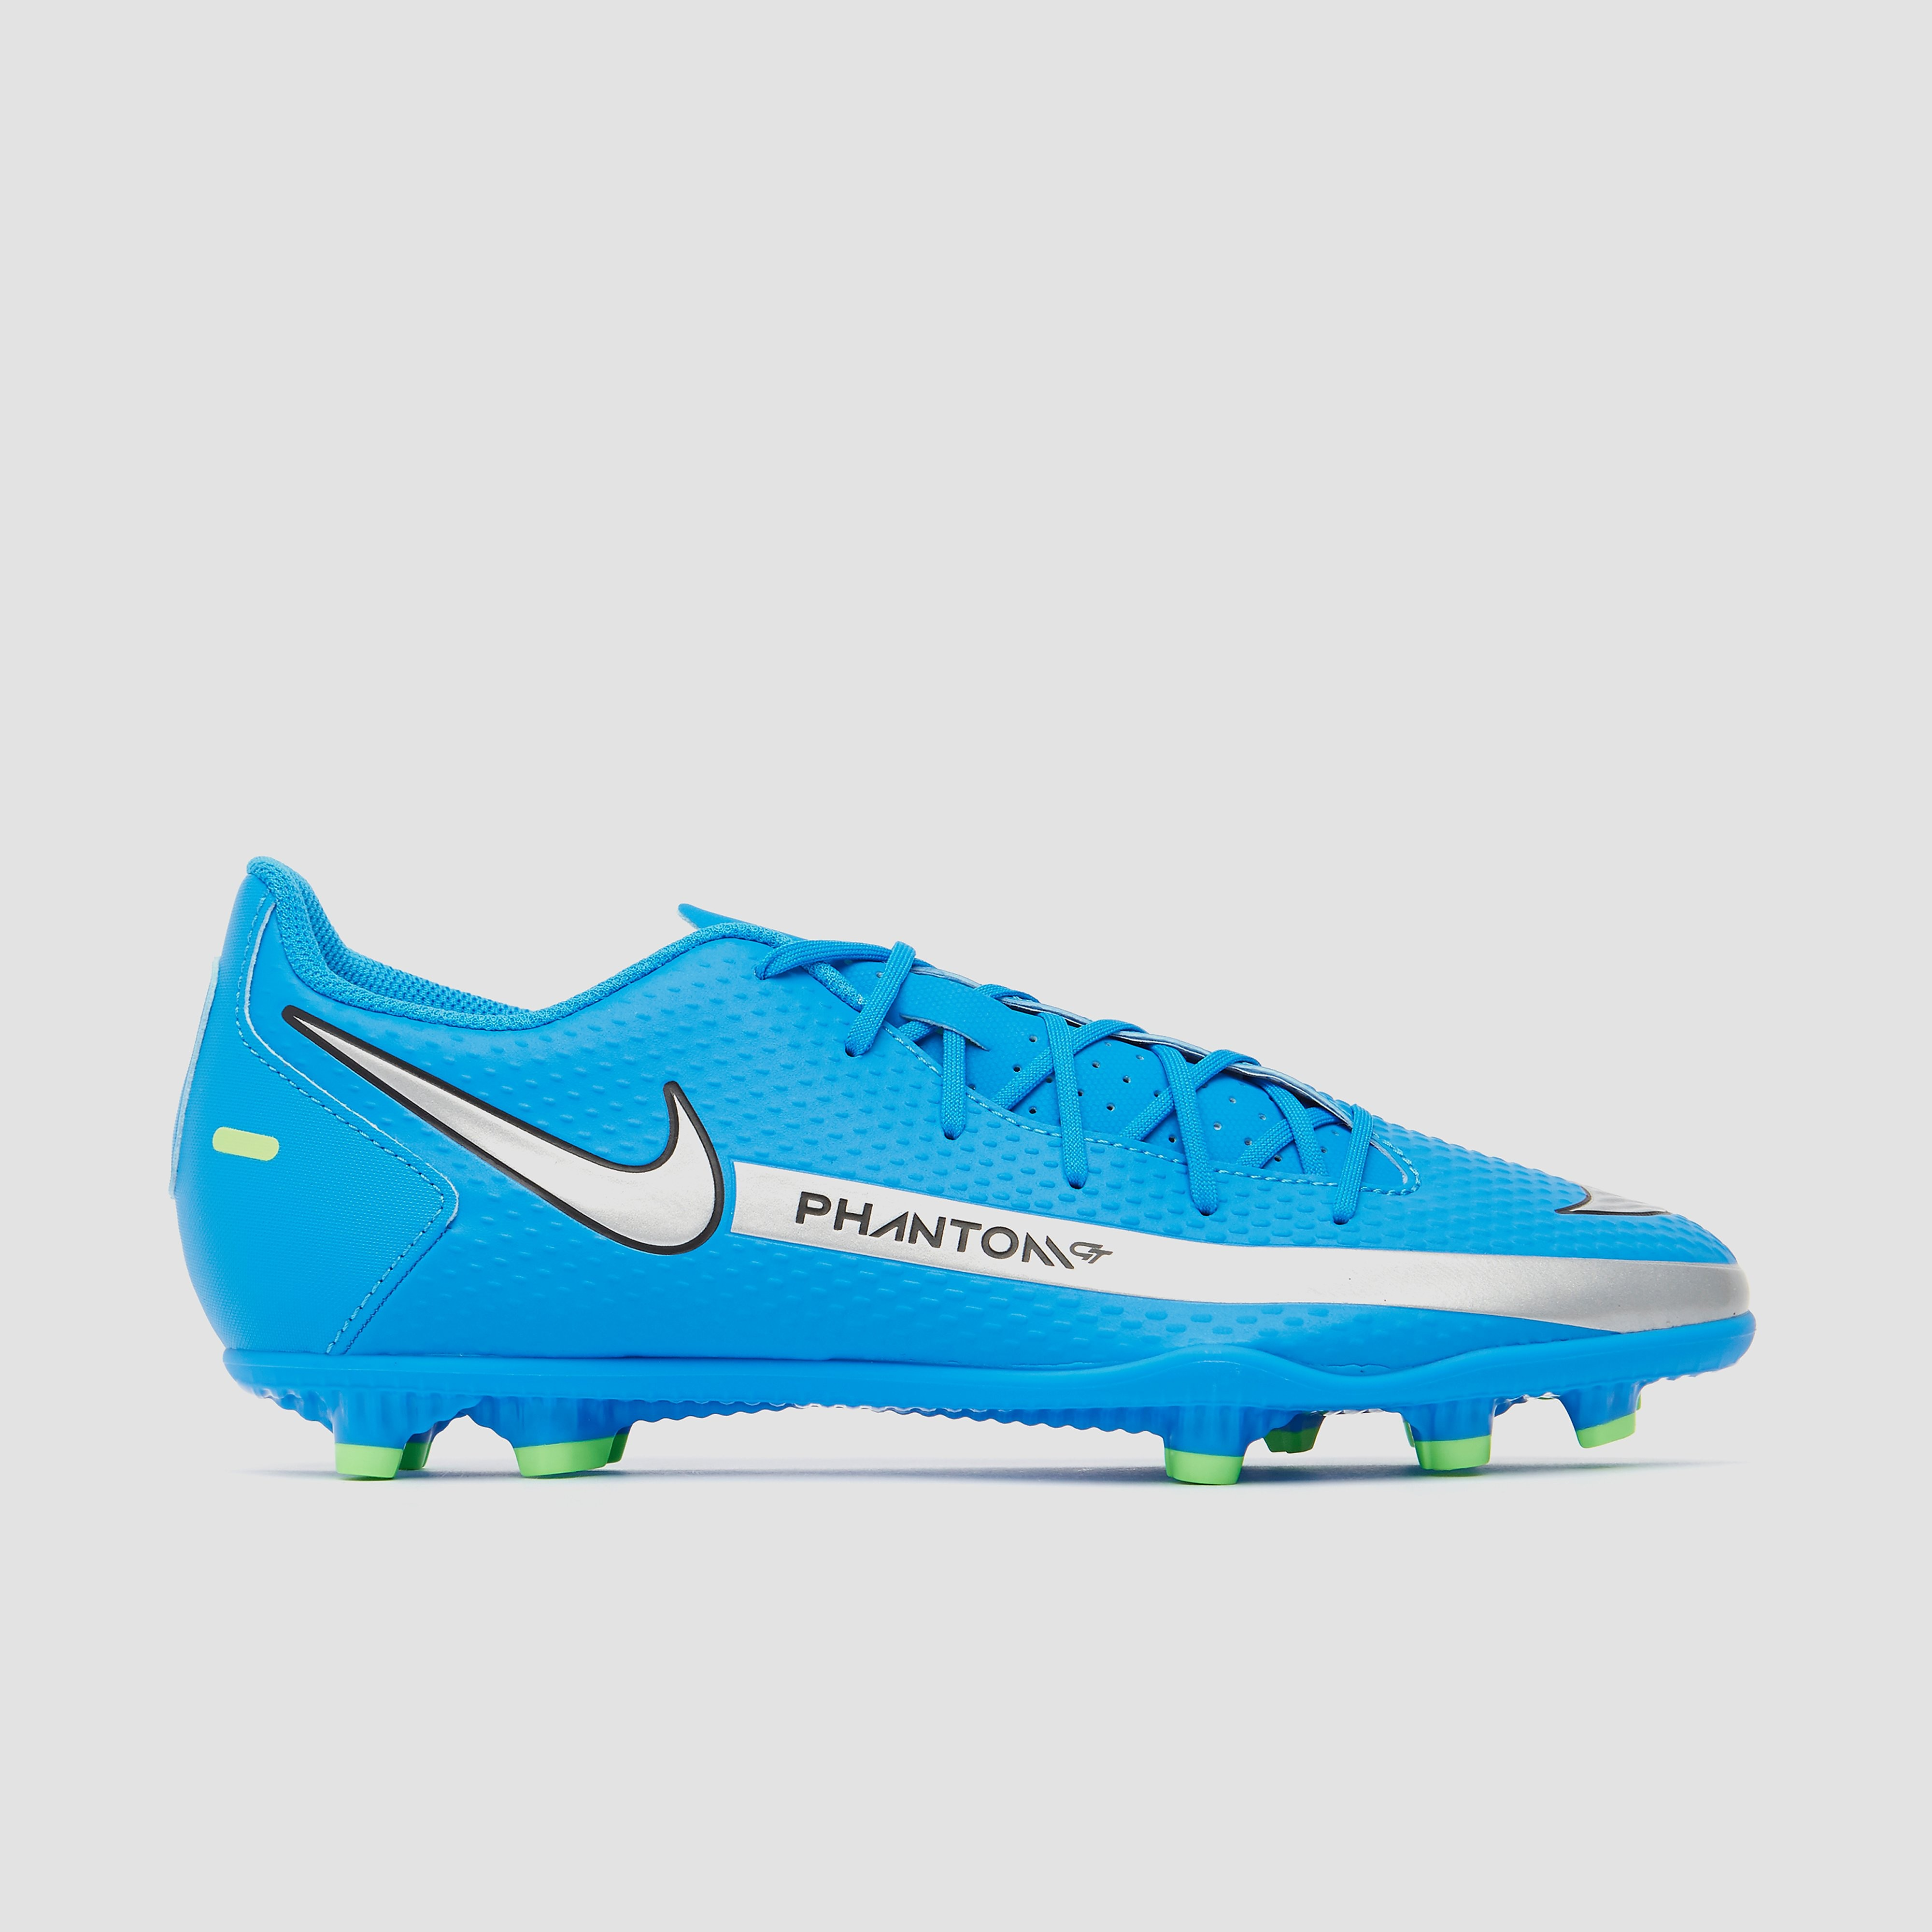 NIKE Phantom gt club mg voetbalschoenen blauw Dames